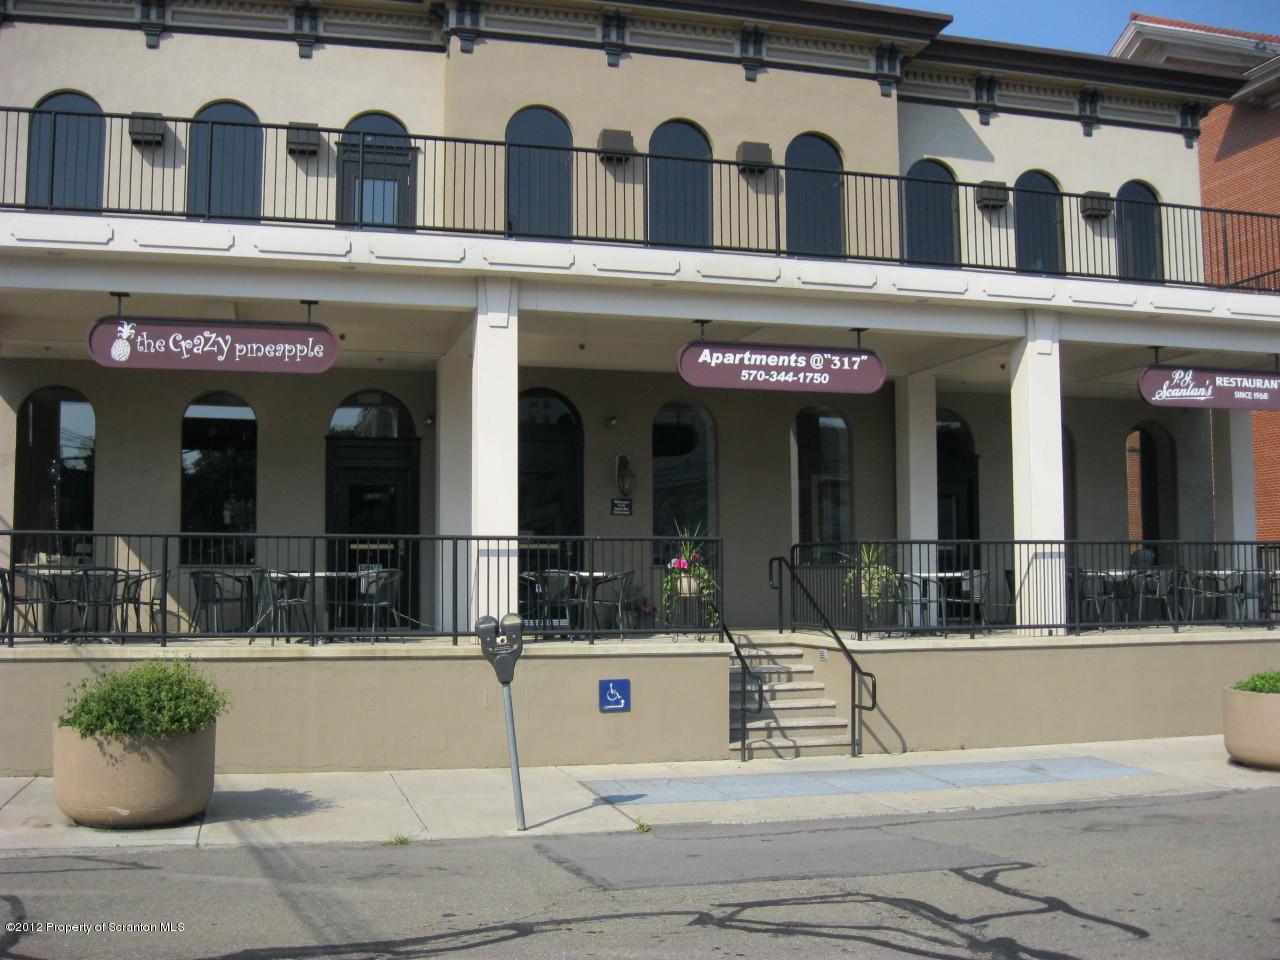 317 Linden St, Scranton, Pennsylvania 18509, ,119 BathroomsBathrooms,Commercial,For Sale,Linden,12-2721